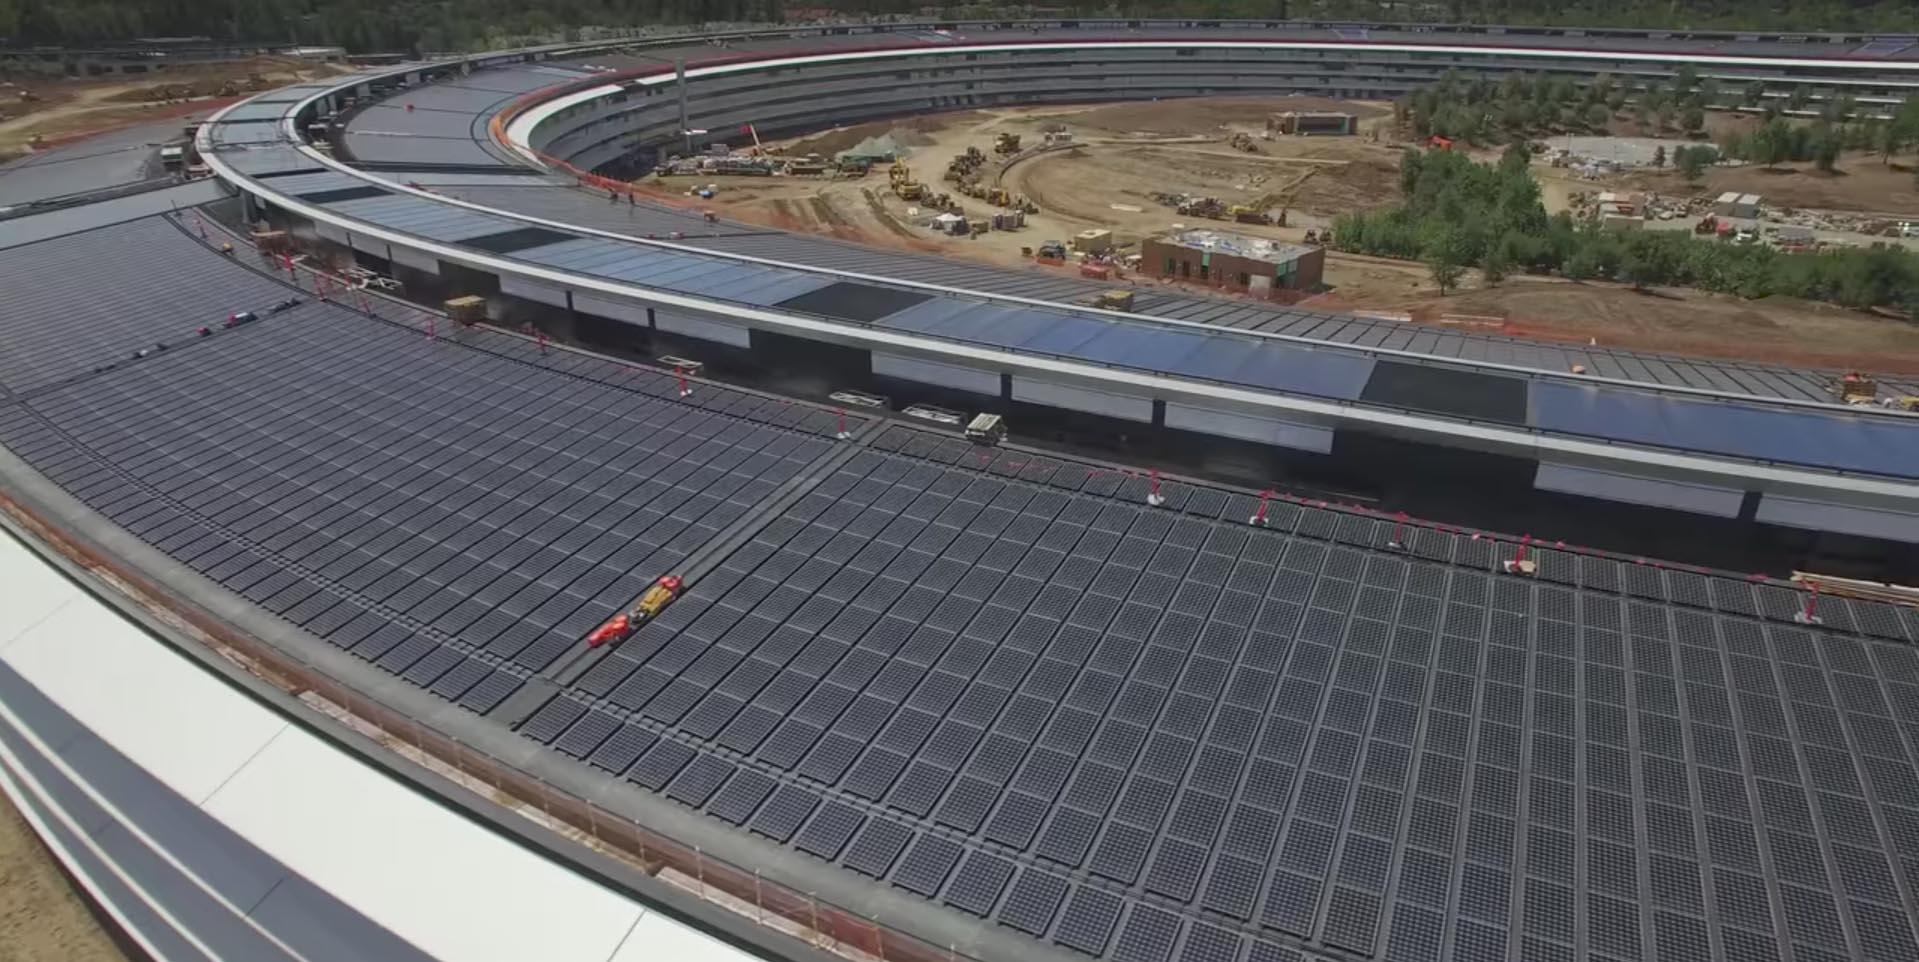 Evolución obras Apple Park - mayo 2017